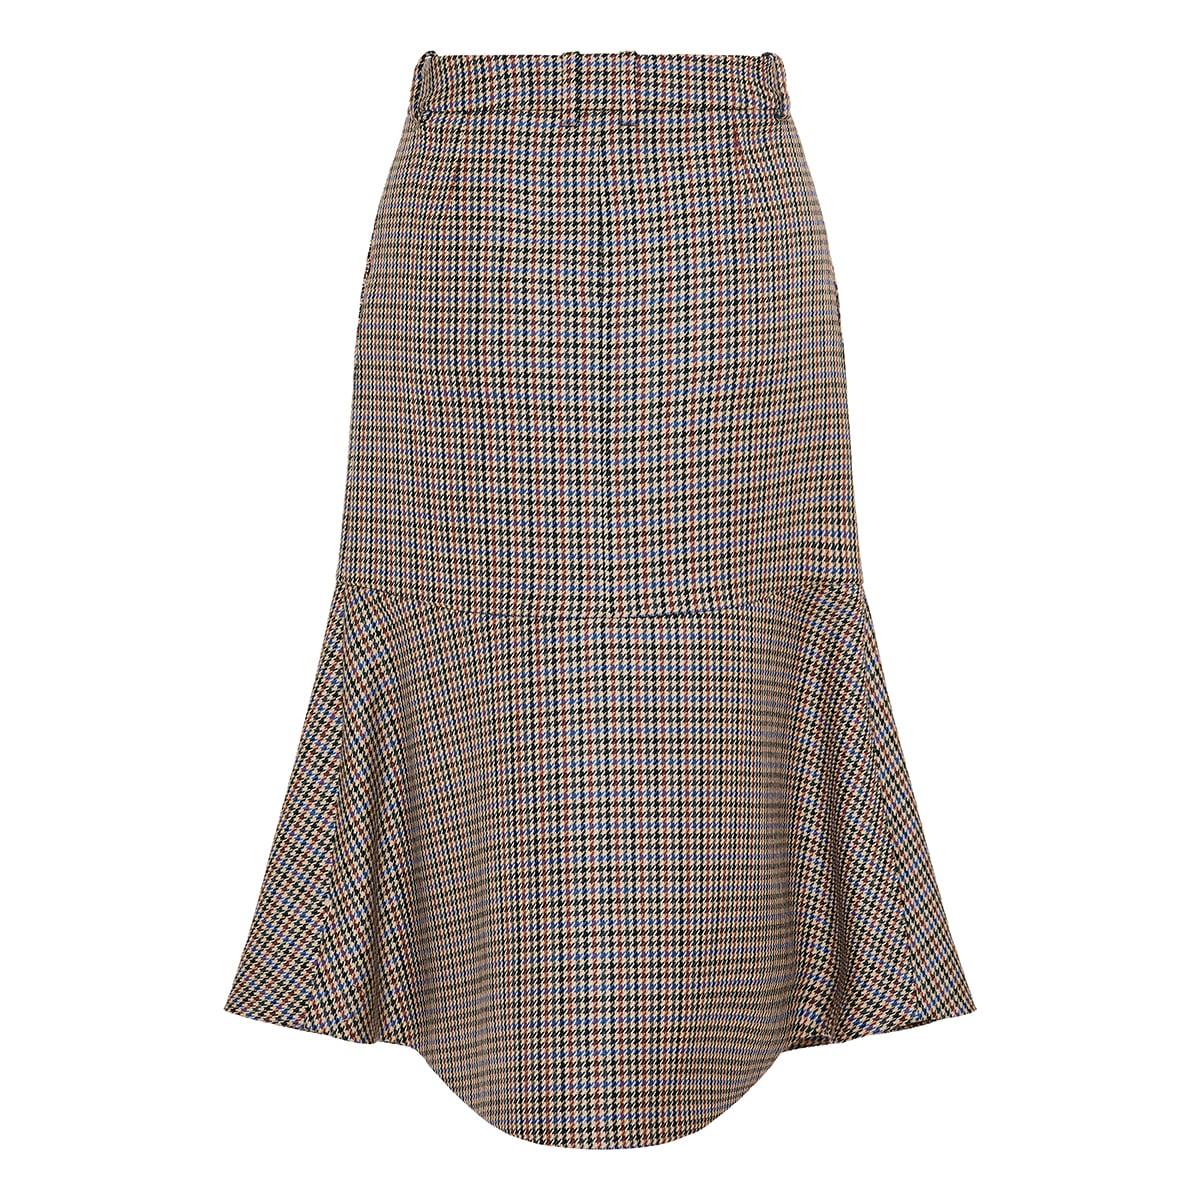 Naomi houndstooth flared midi skirt